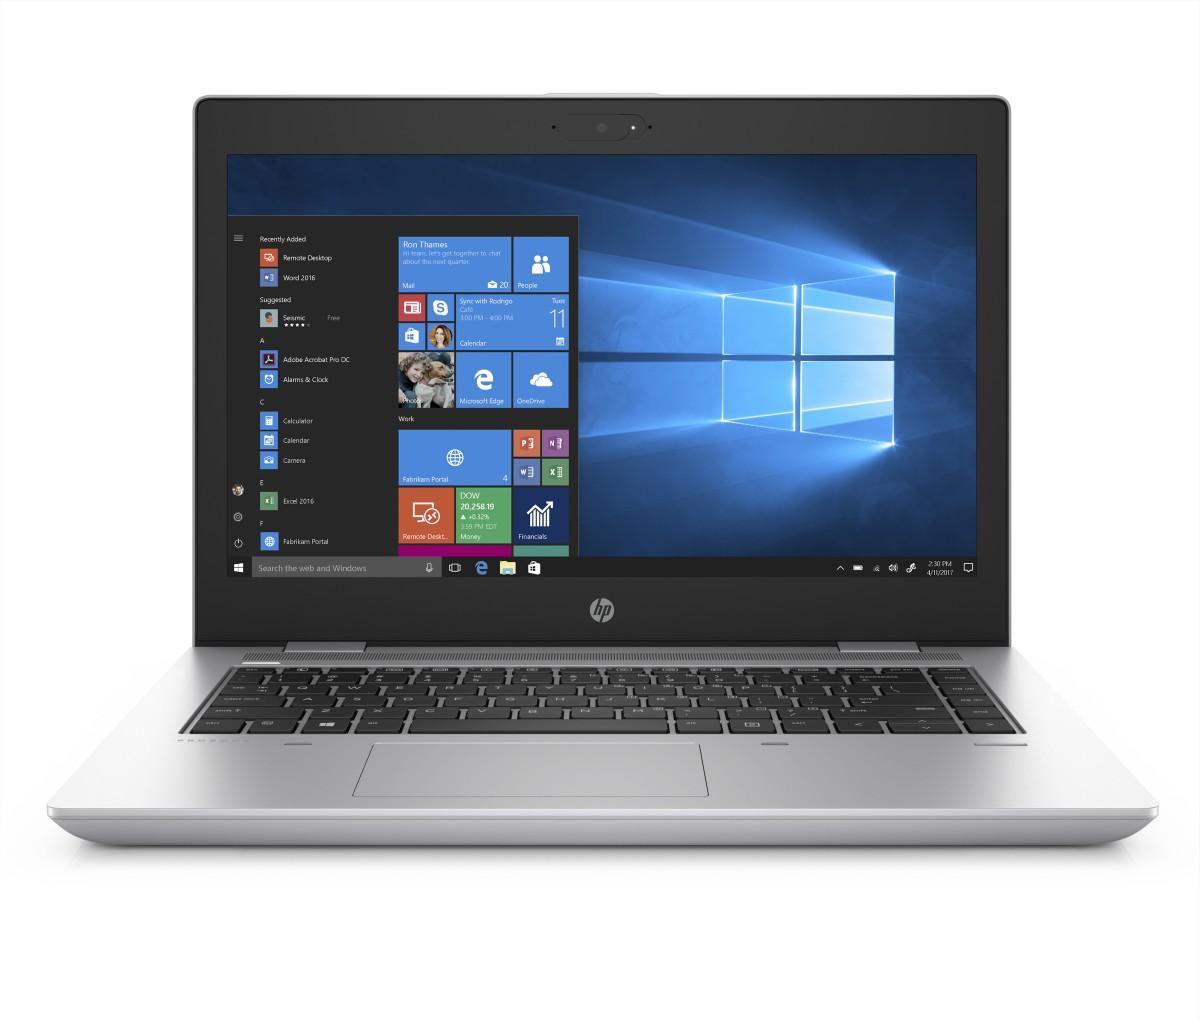 "HP ProBook 640 G4 14"" FHD i5-8250U/4GB/256SSD/VGA/DP/RJ45/WIFI/BT/MCR/FPR/1RServis/W10P"